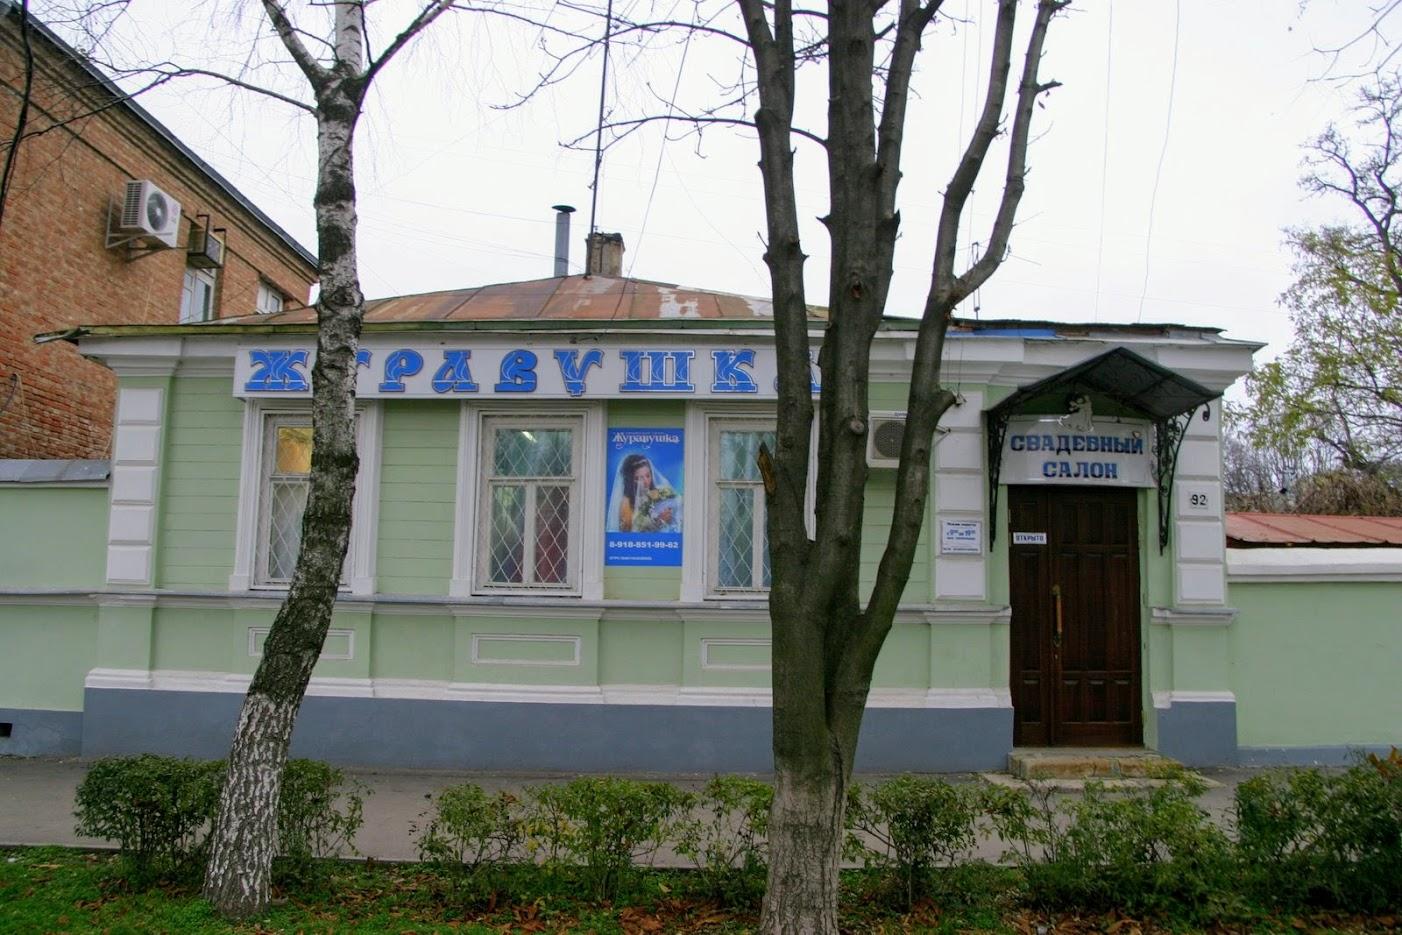 https://sites.google.com/site/istoriceskijtaganrog/cehova-ulica/dom-92